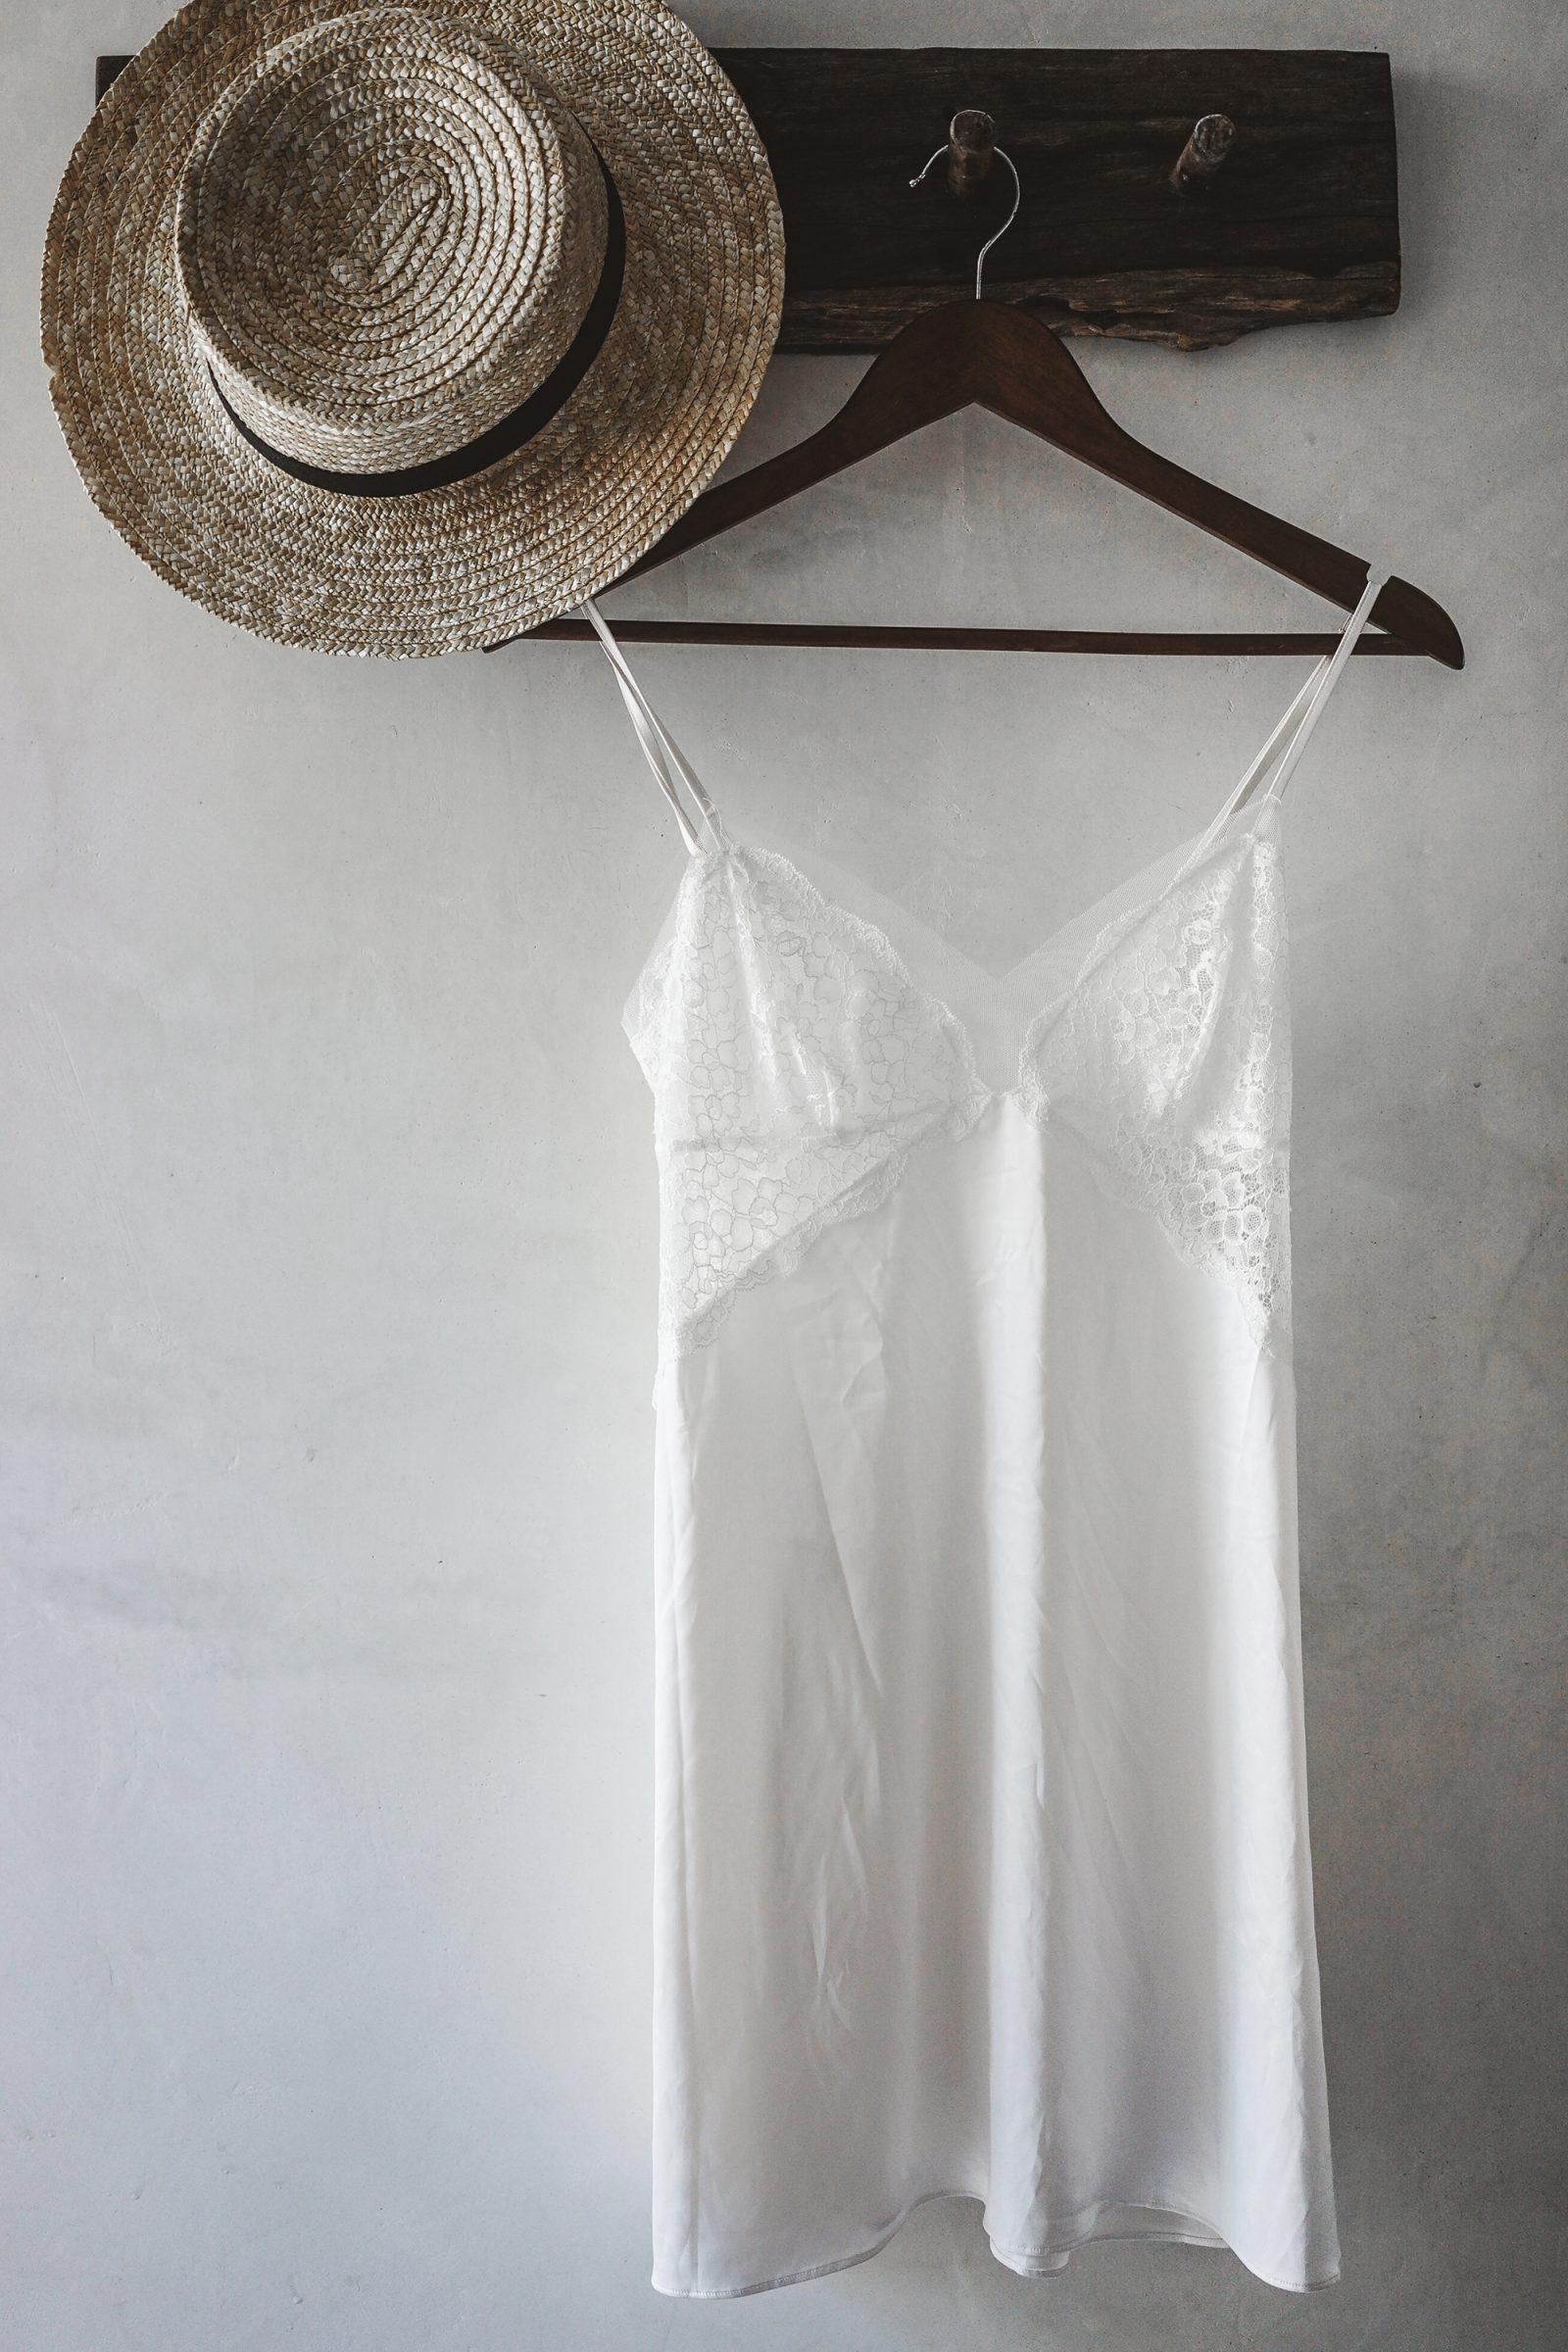 slip_dress-sanara_tulum-beach-mexico-outfit-collage_vintage-2